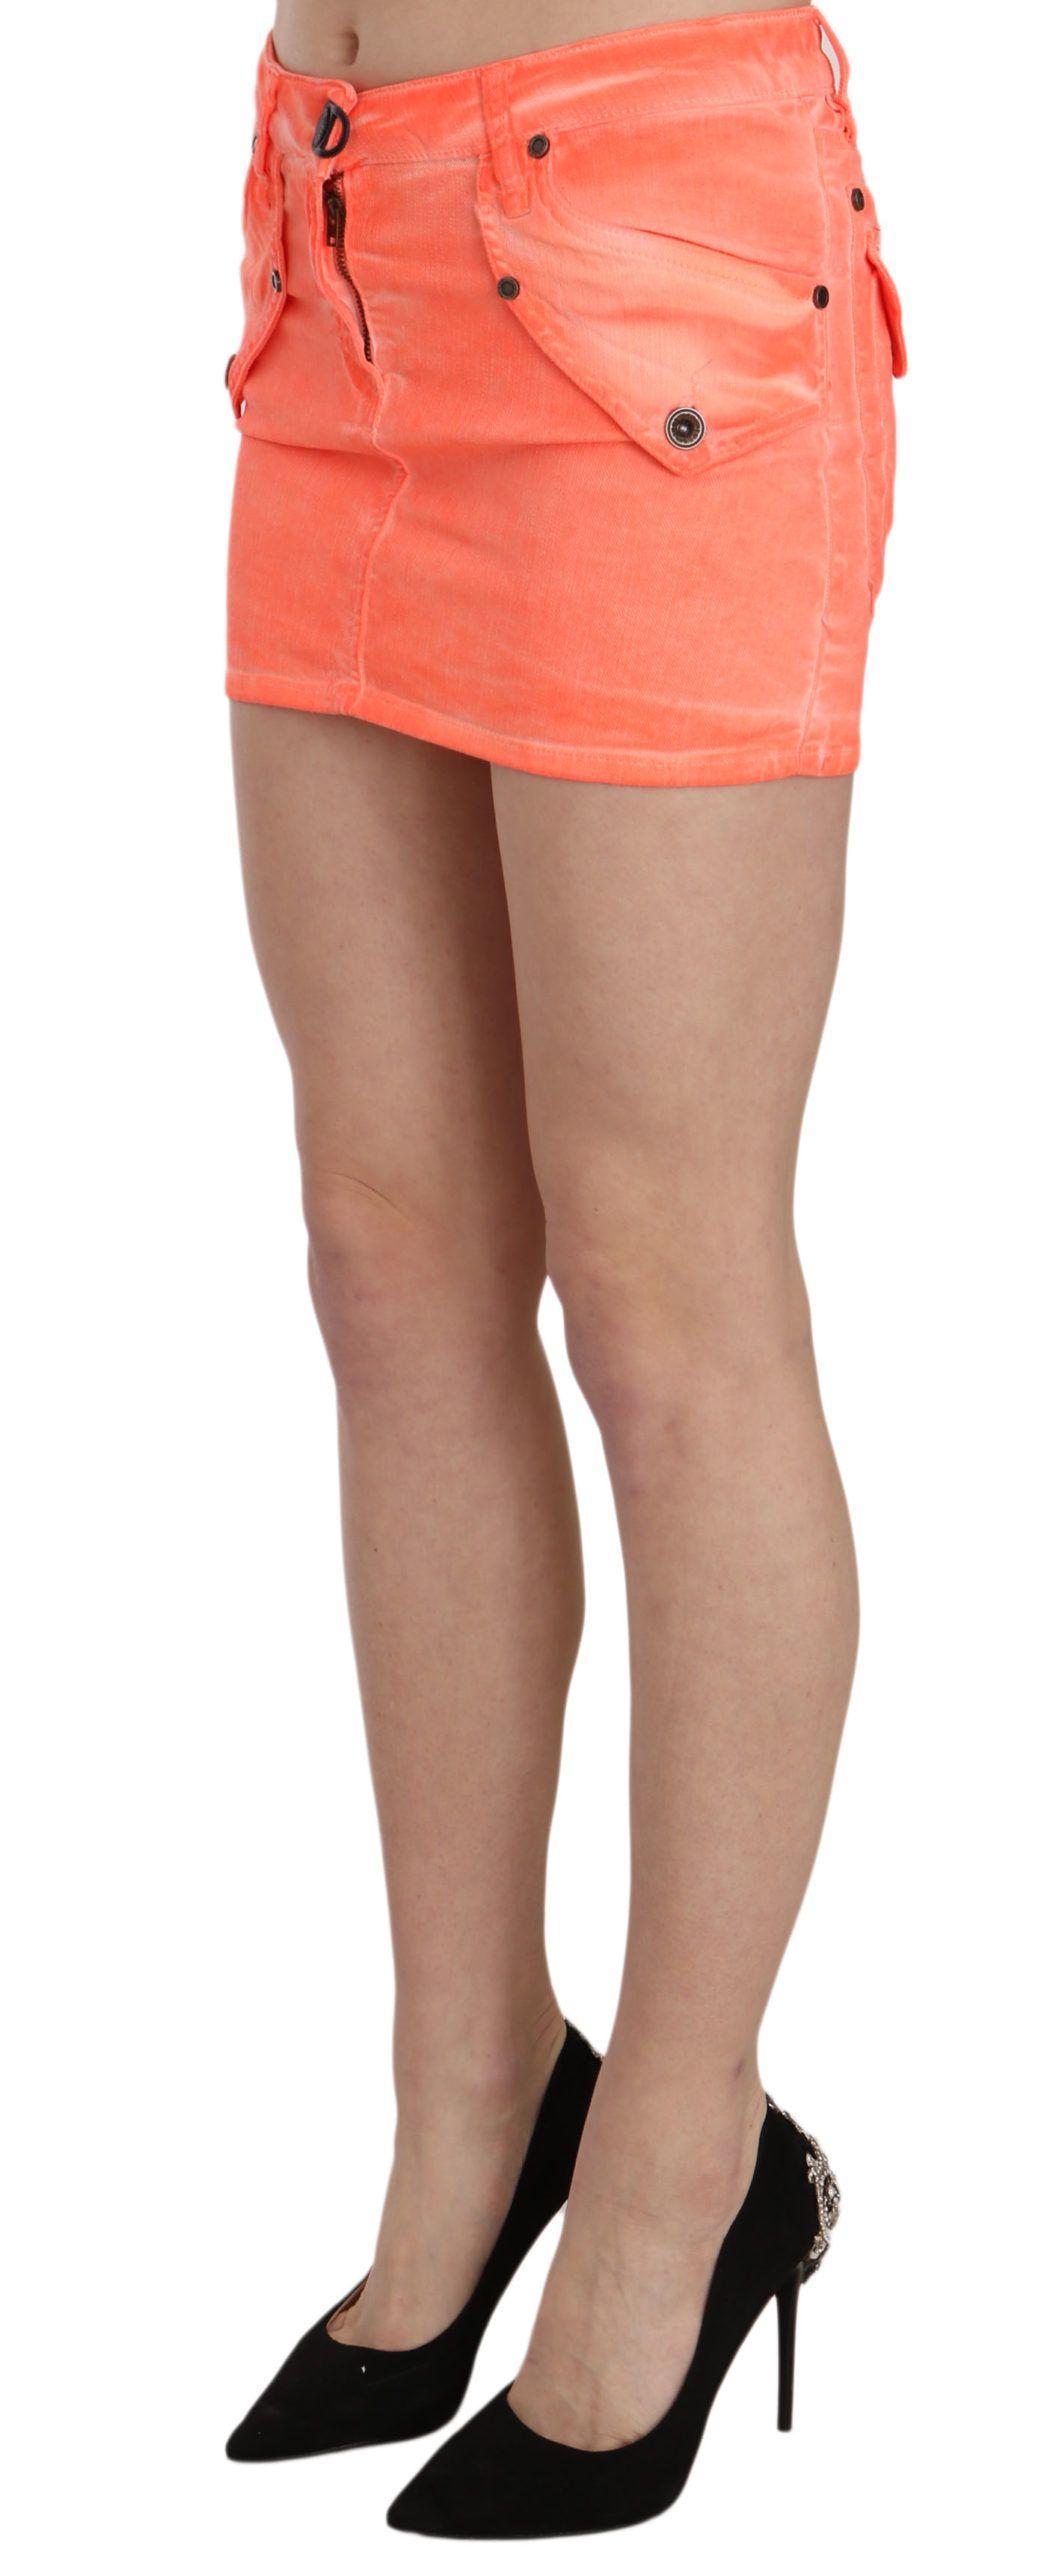 PLEIN SUD Orange Cotton Stretch Casual Mini Skirt